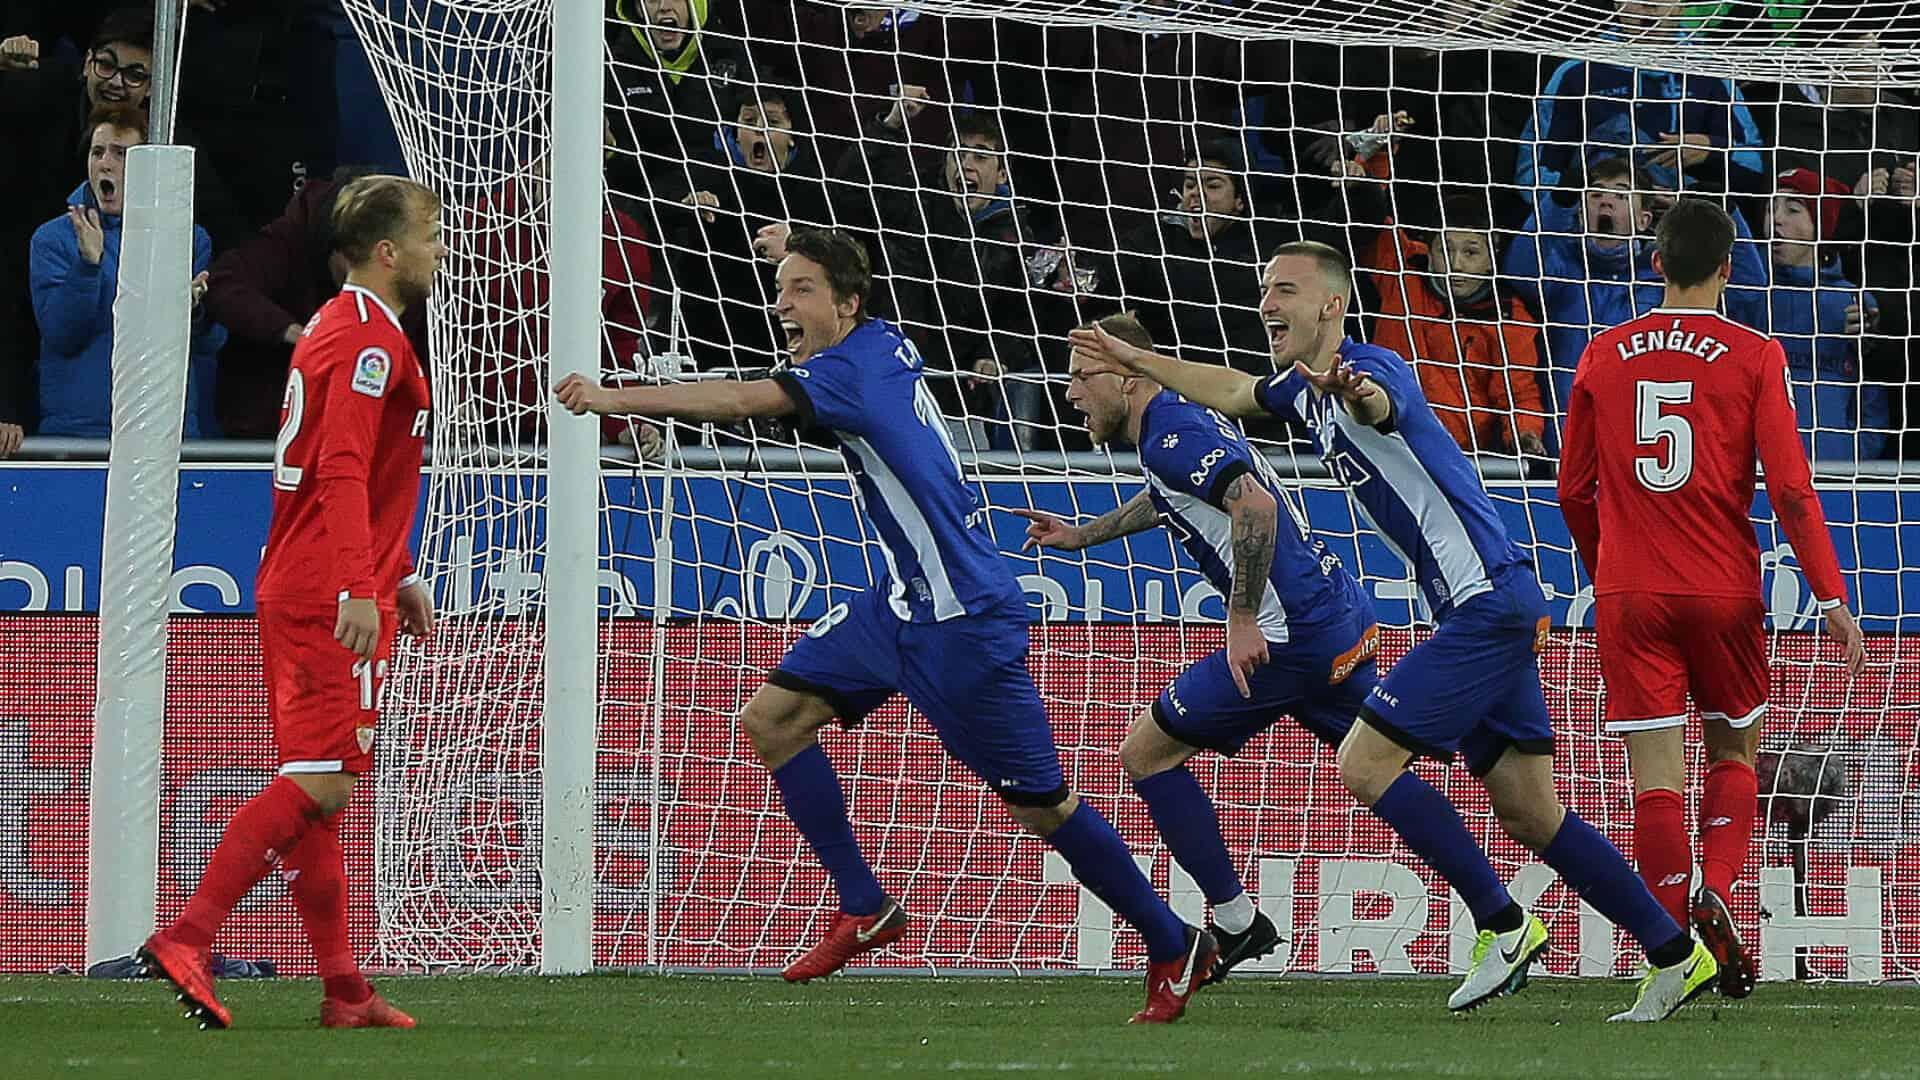 DEPORTIVO ALAVES FC SOCCER TEAM 2019